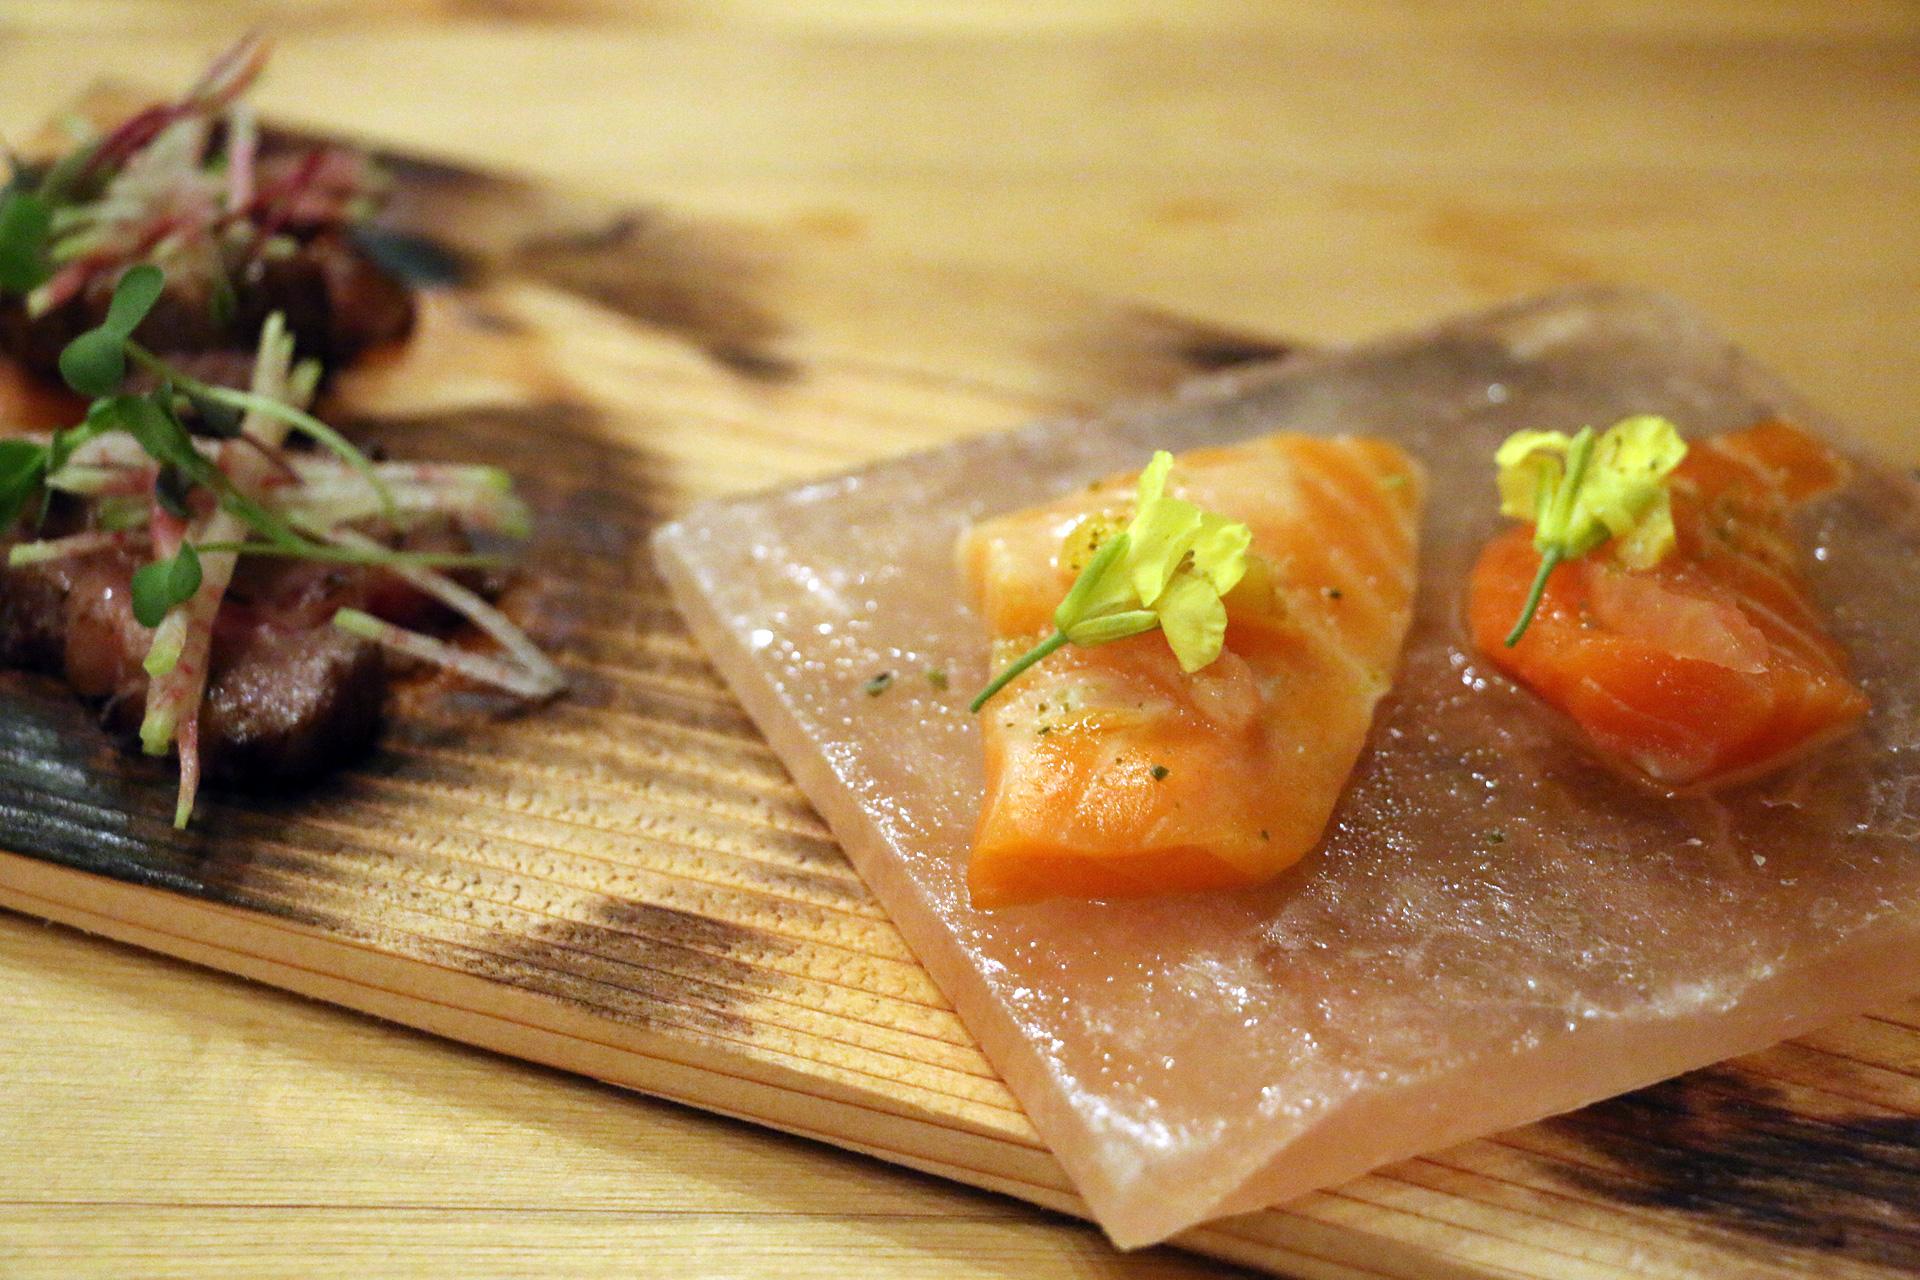 Surf and turf: raw salmon and seared Wagyu beef.